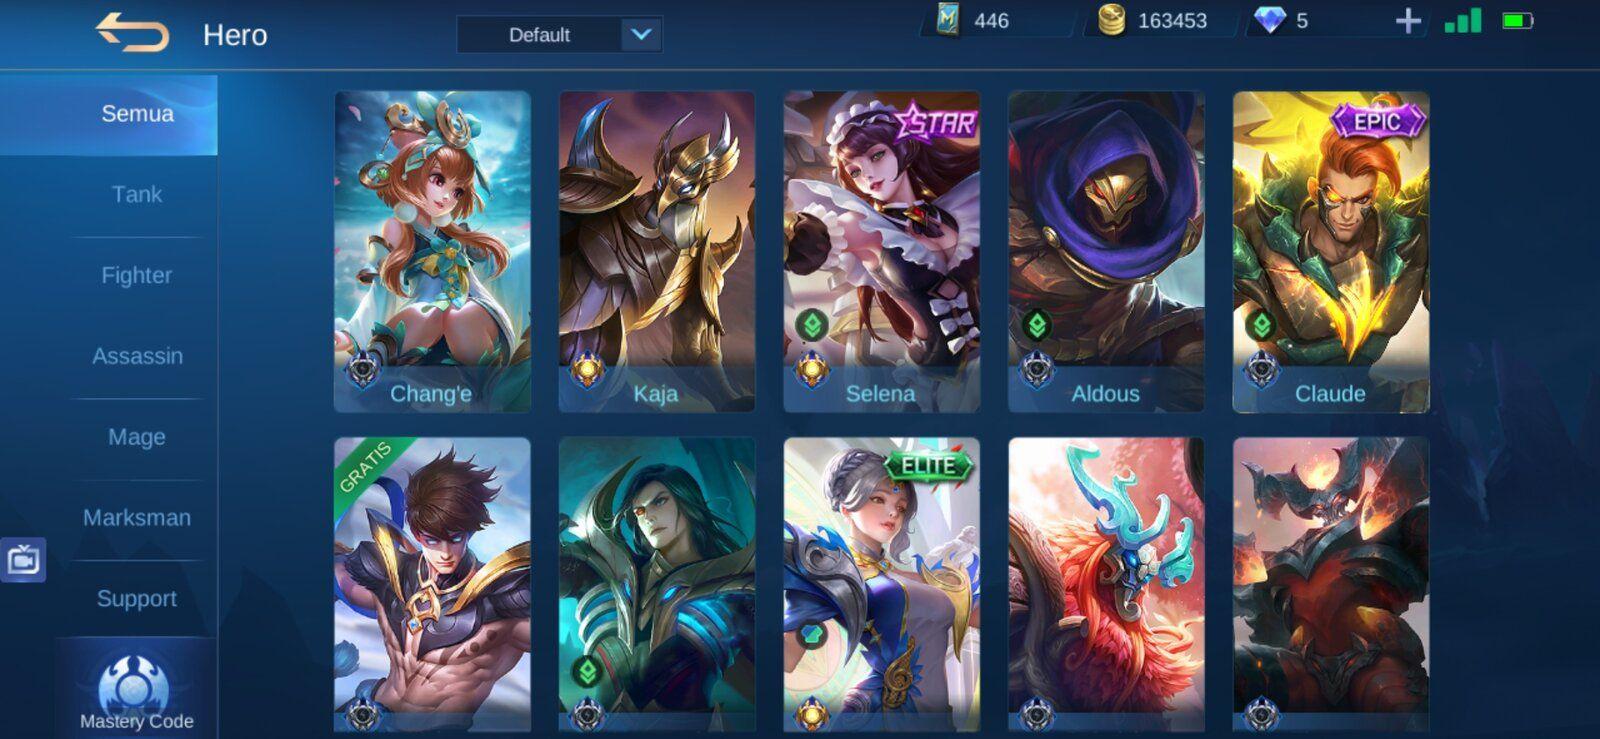 Screenshot_20200127-045514_Mobile Legends Bang Bang.jpg